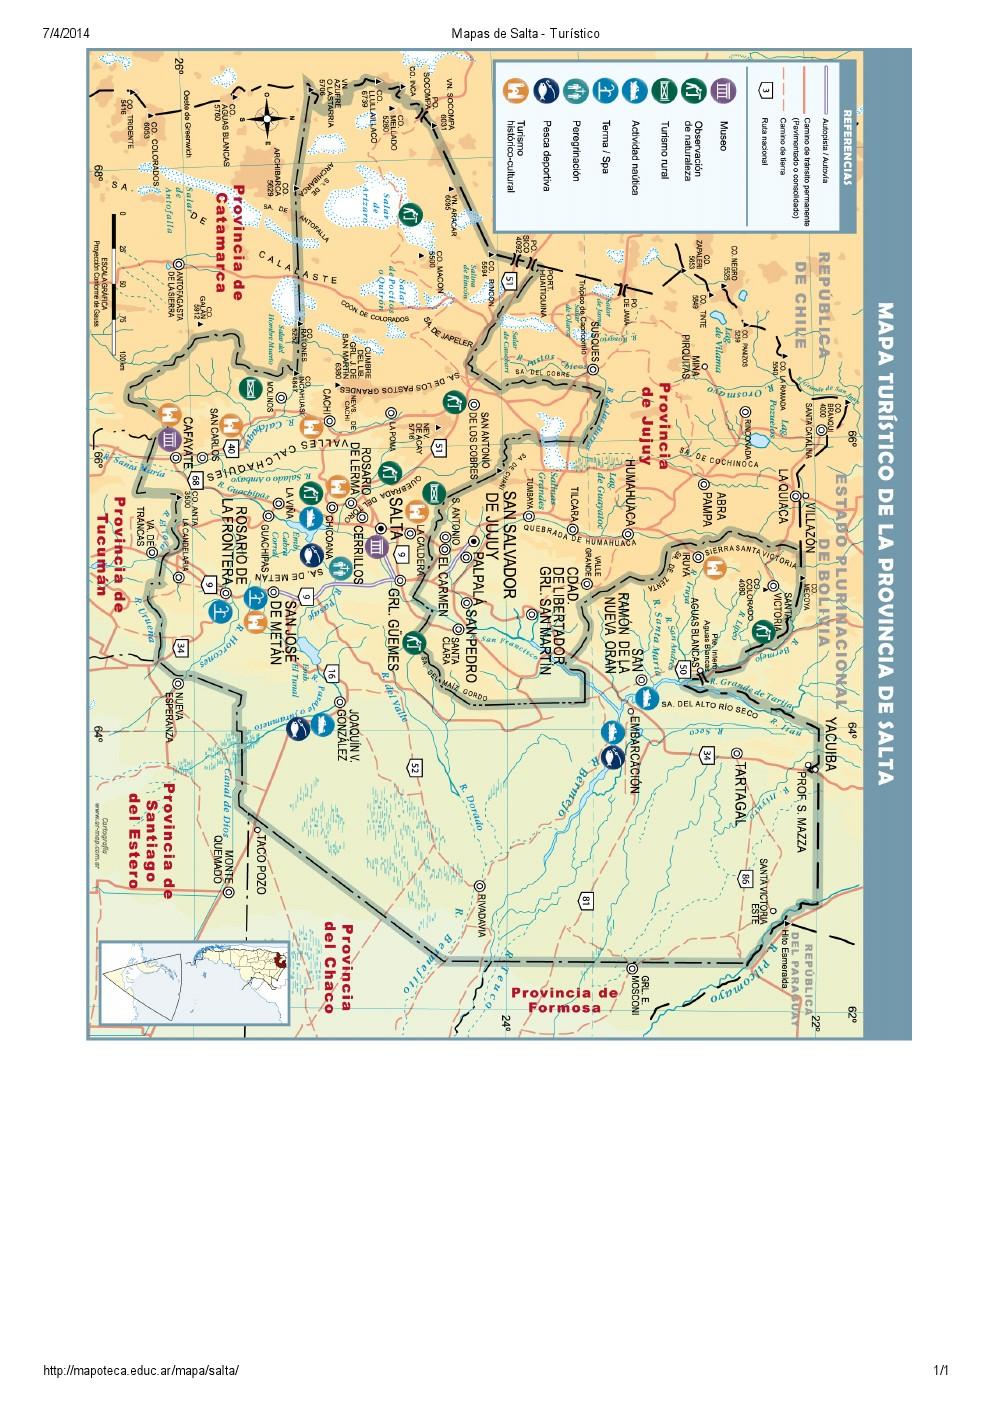 Mapa turístico de Salta. Mapoteca de Educ.ar